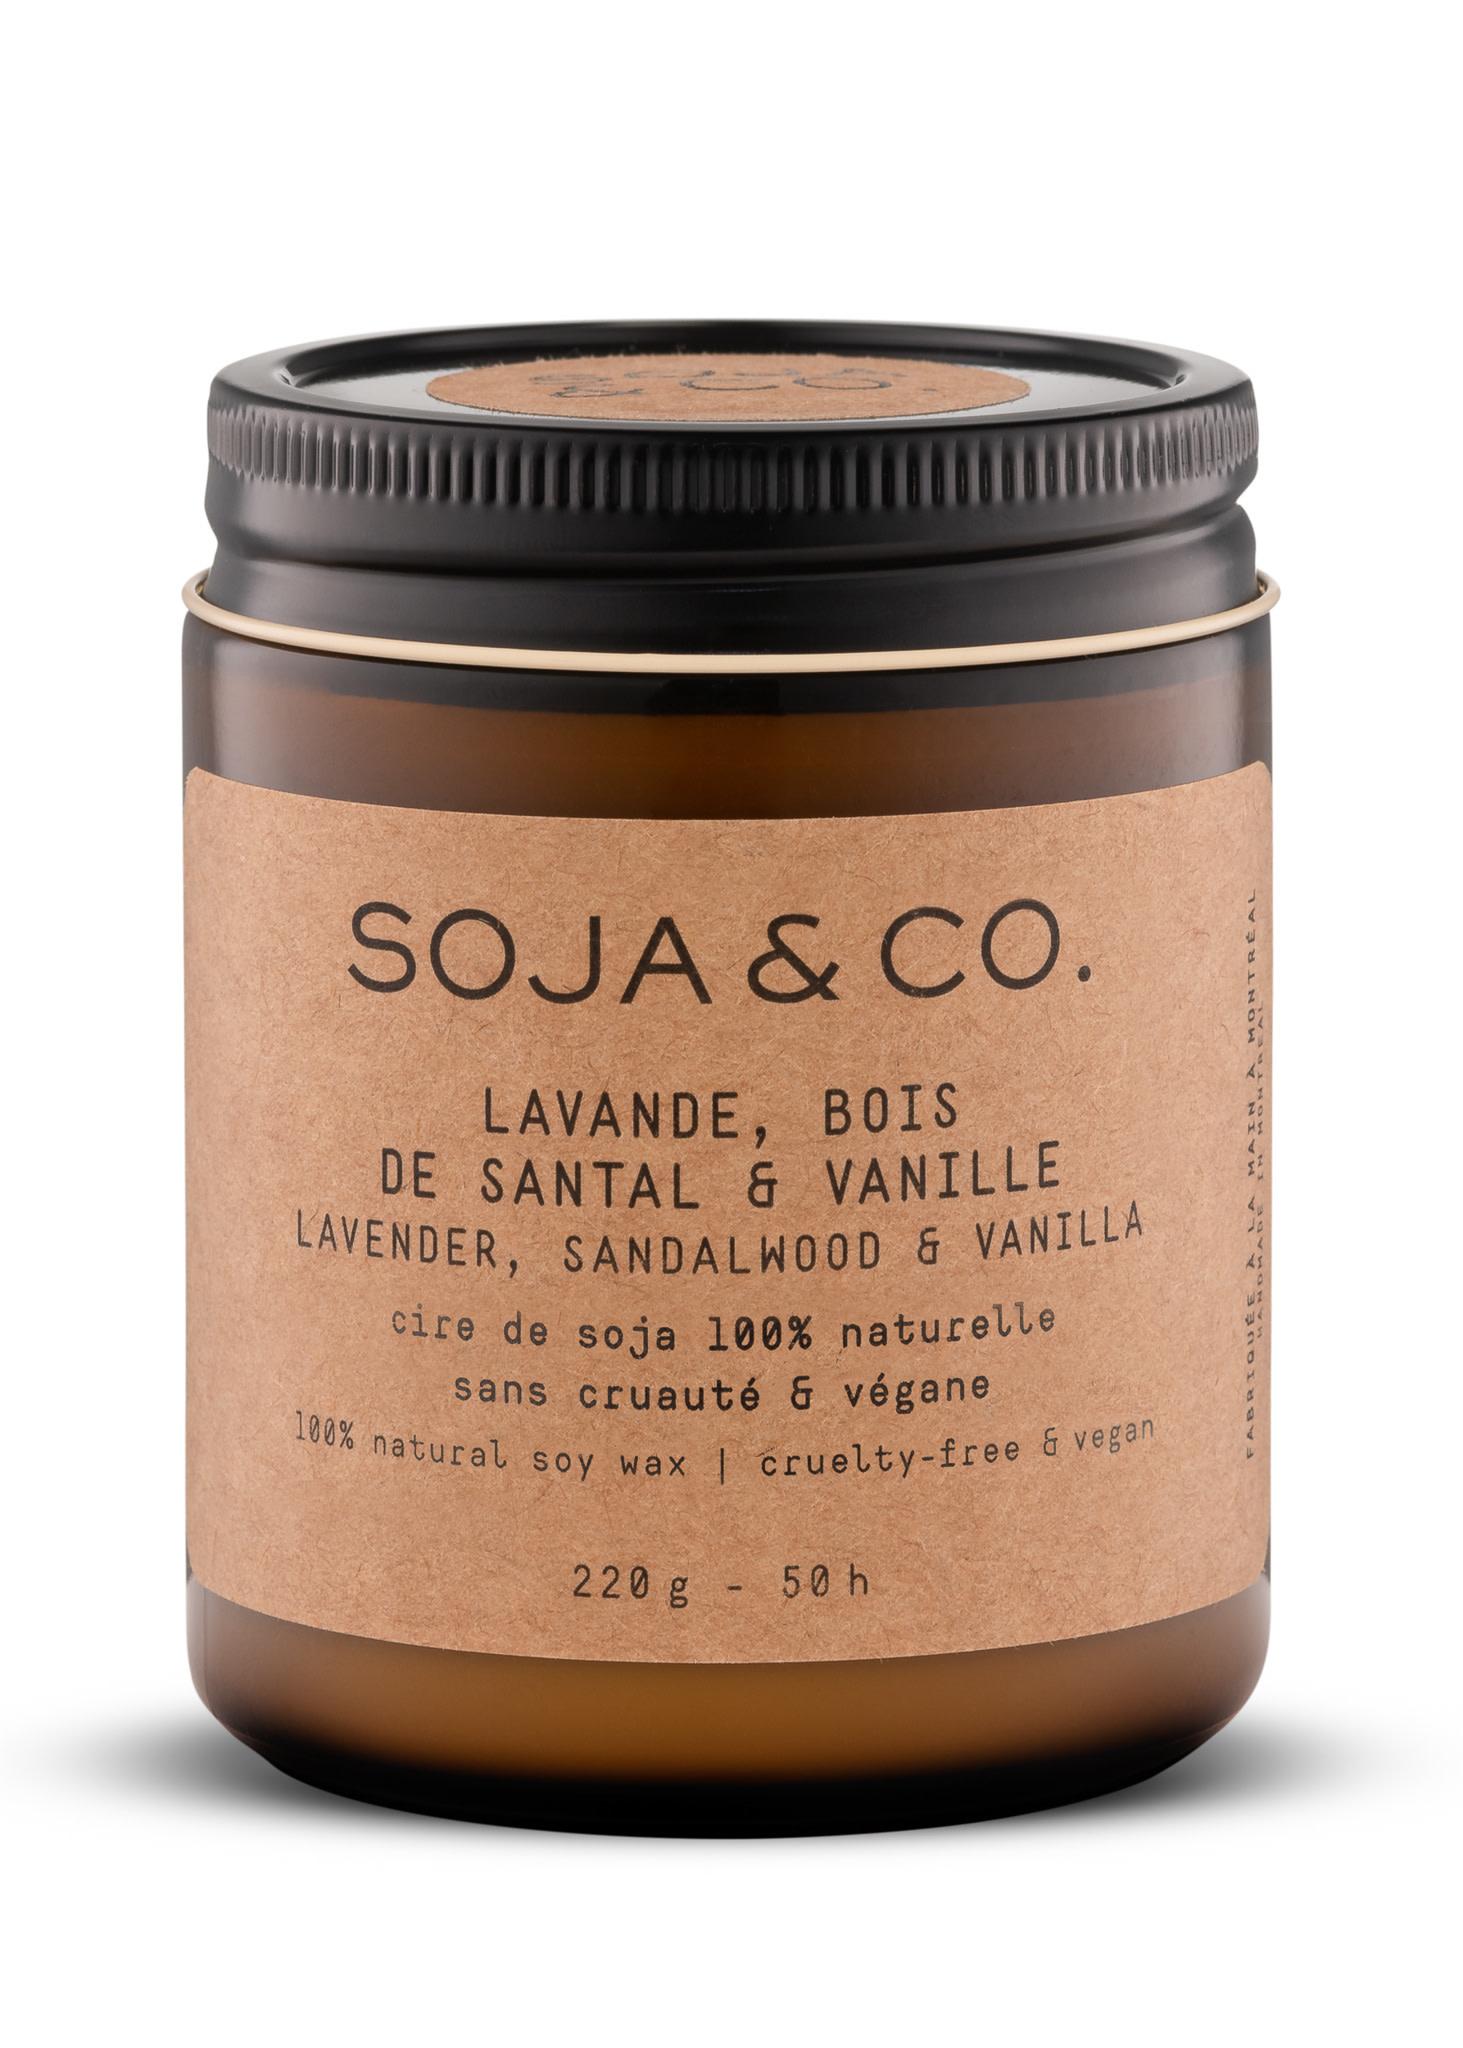 SOJA & CO Bougie lavande, bois de santal & vanille